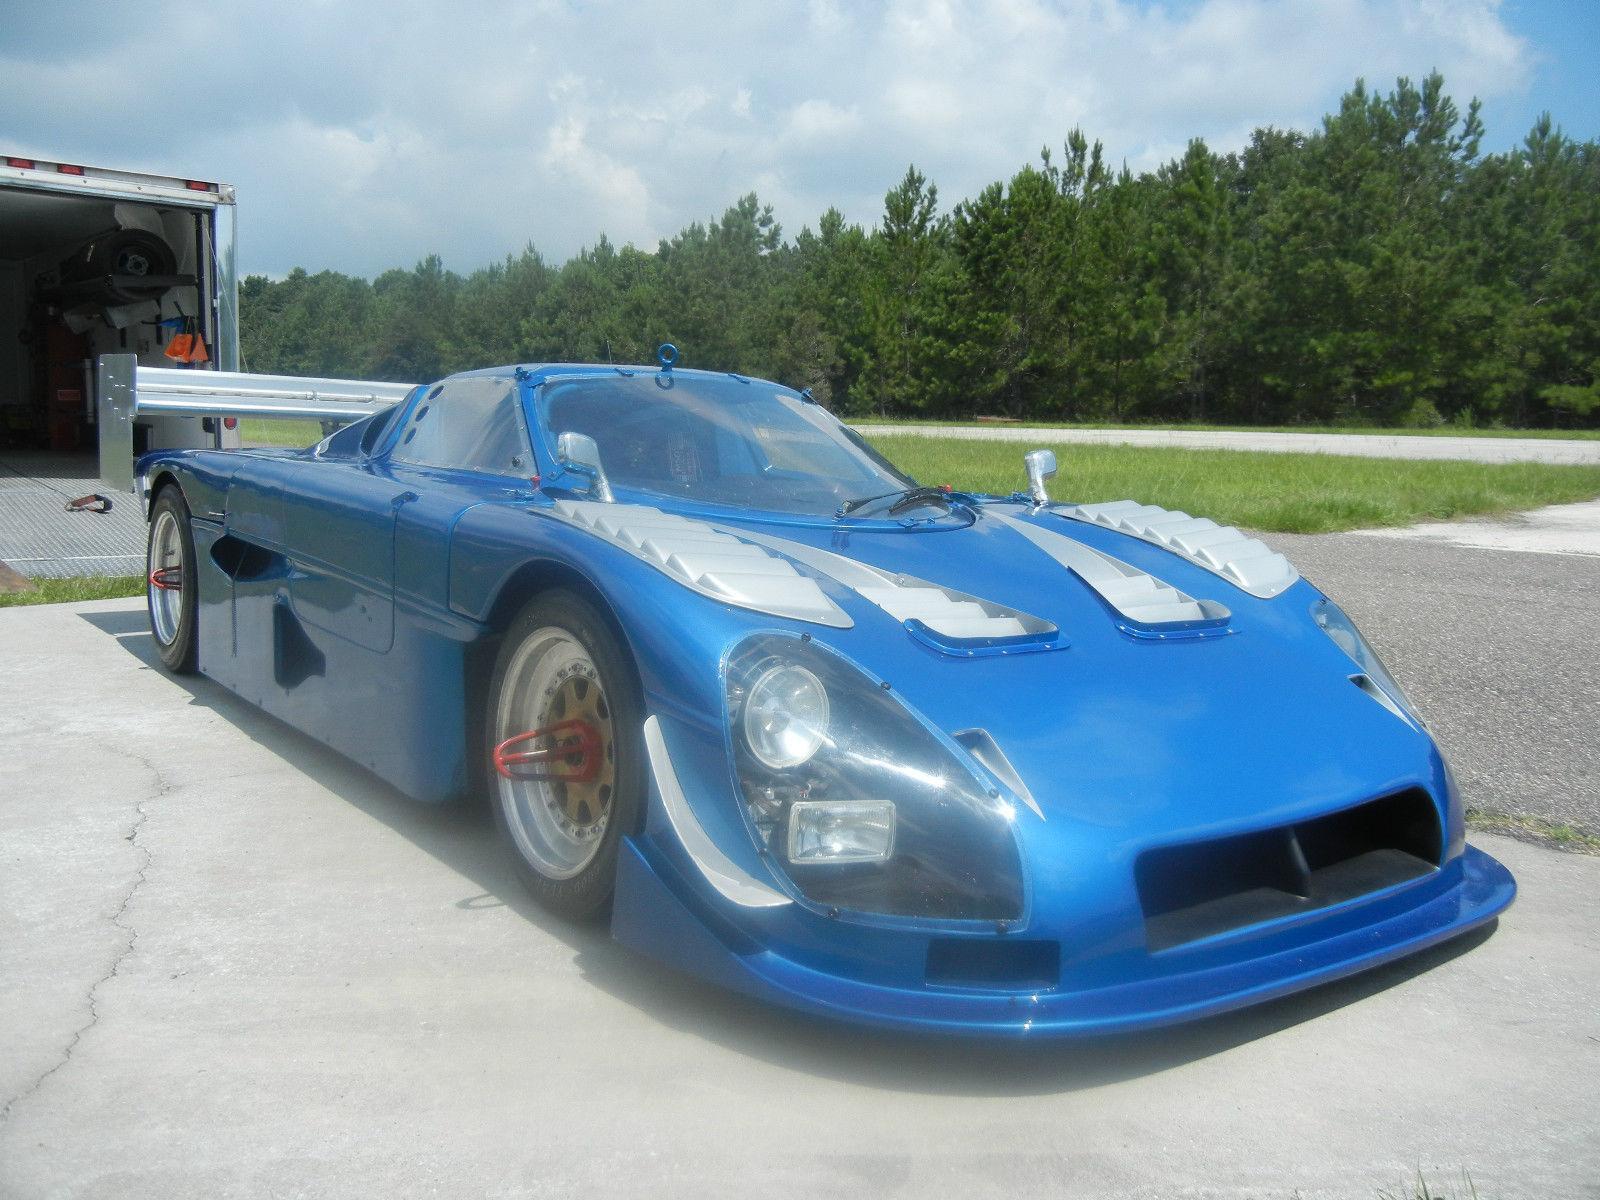 Historic works spice gtp v8 light imsa race car for sale for Motor cars for sale